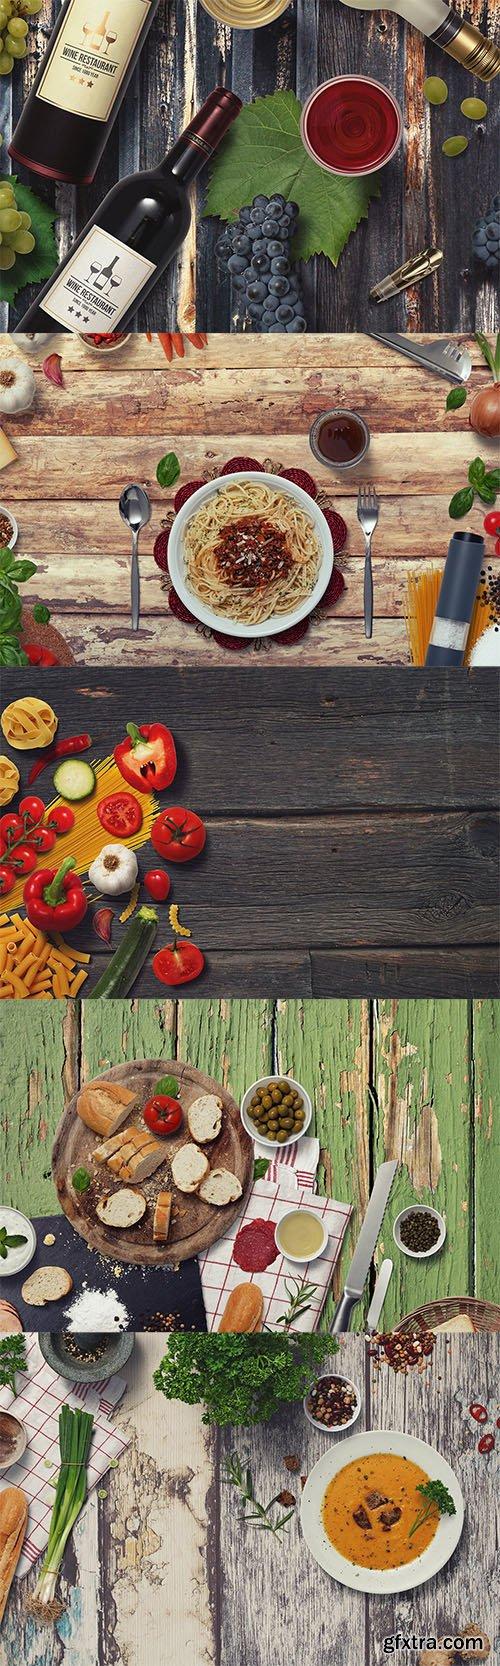 Kitchen Mockup Scenes Vol.4